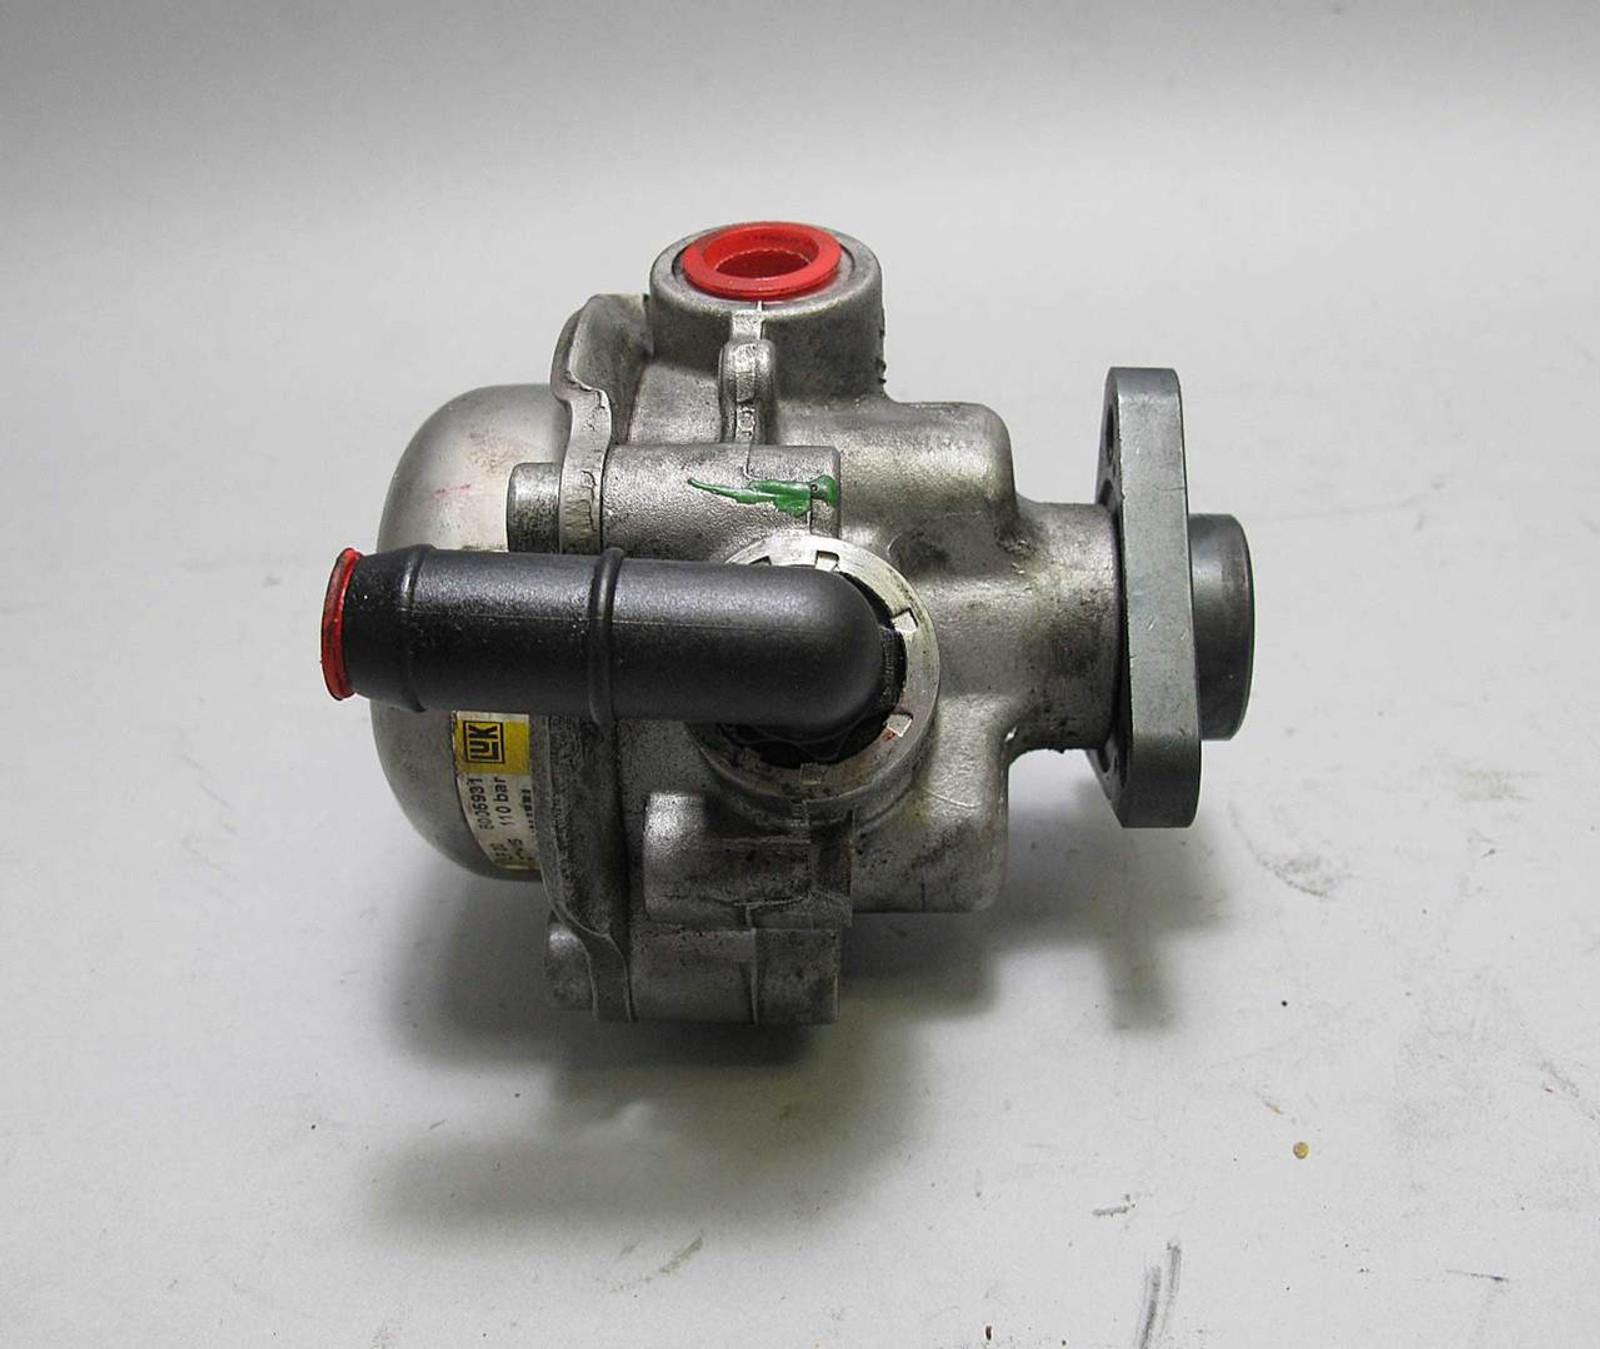 Bmw E46 3 Series Power Steering Pump Lf 20 Luk 2003 2006 325i 330i Location